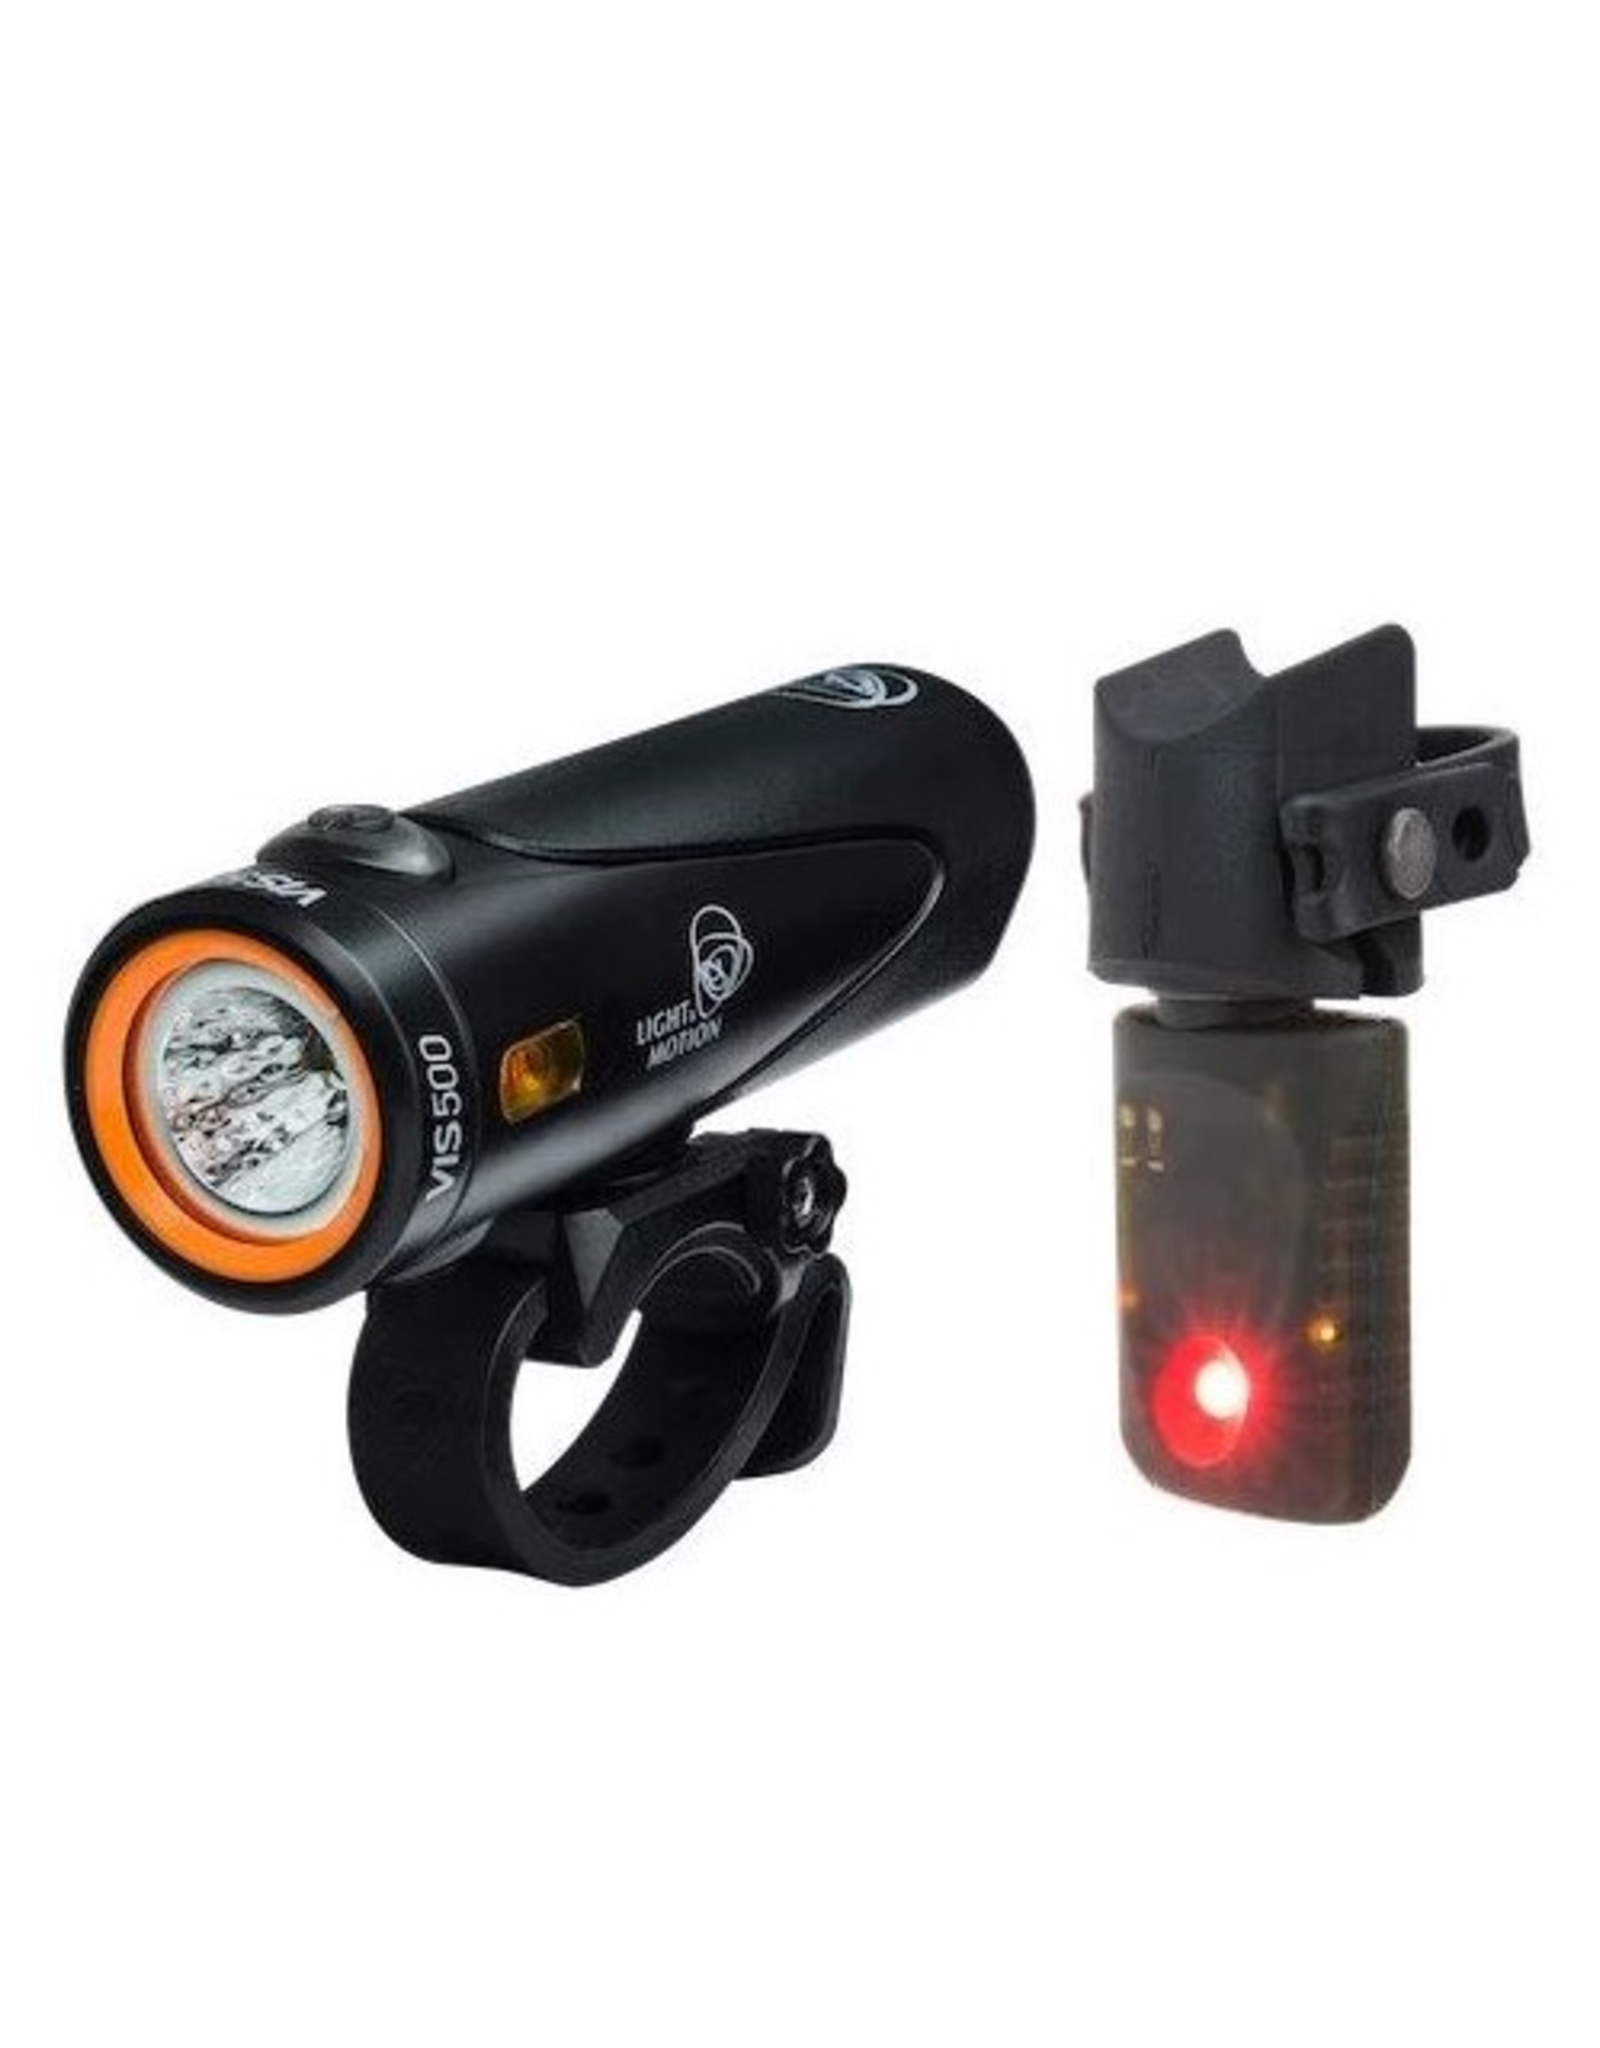 Light and Motion Light & Motion VIS 500 Onyx + Vya TL Combo Light Set